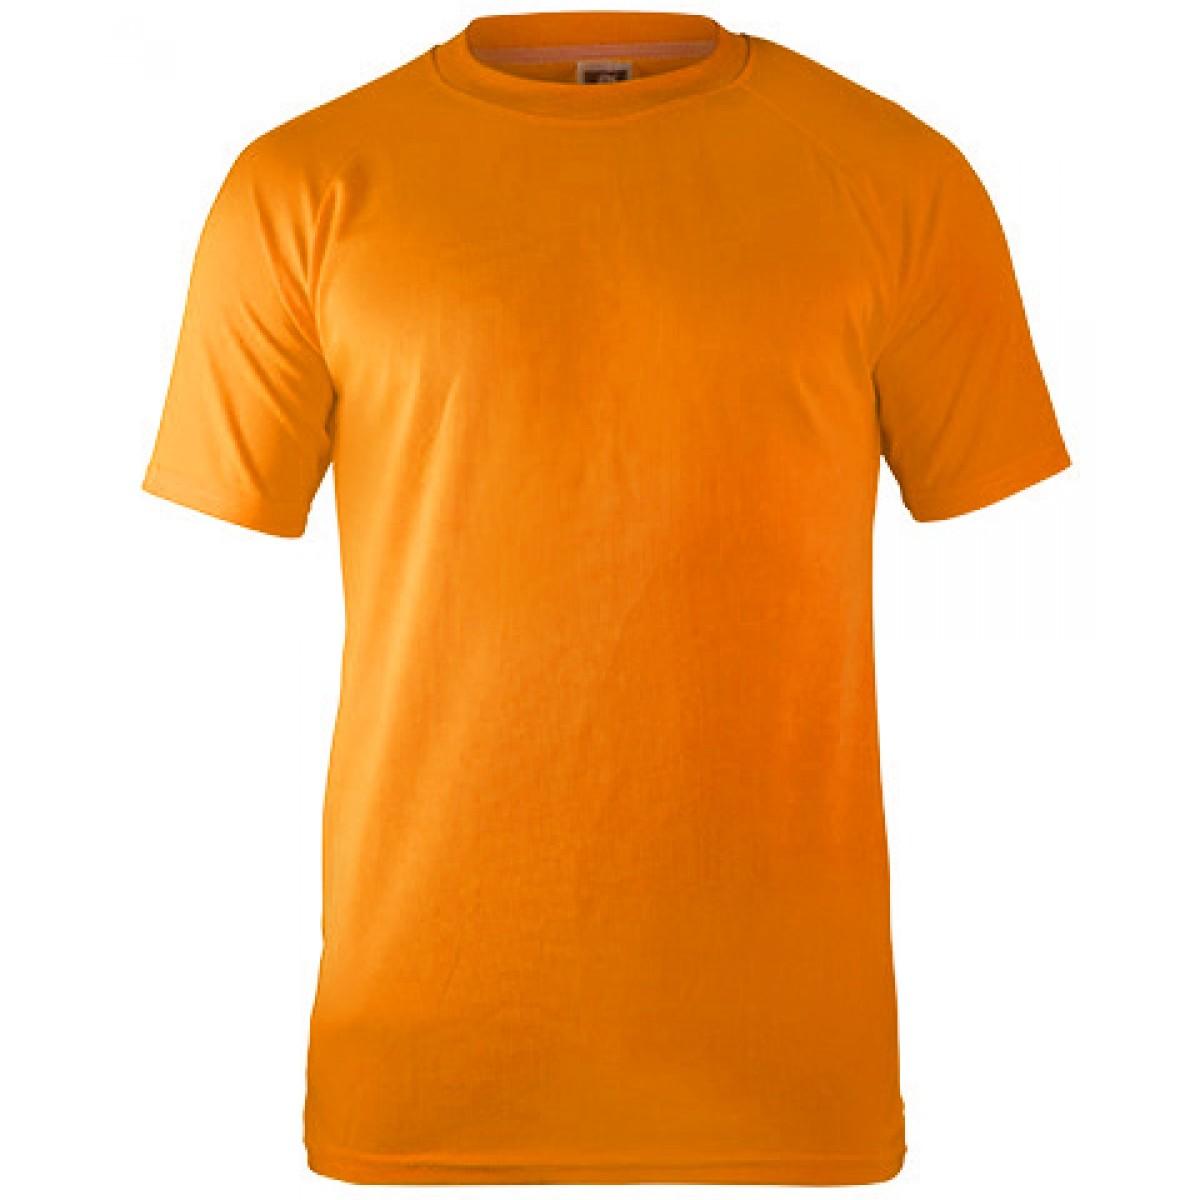 Short Sleeves Mesh Performance T-shirt-Safety Orange-M